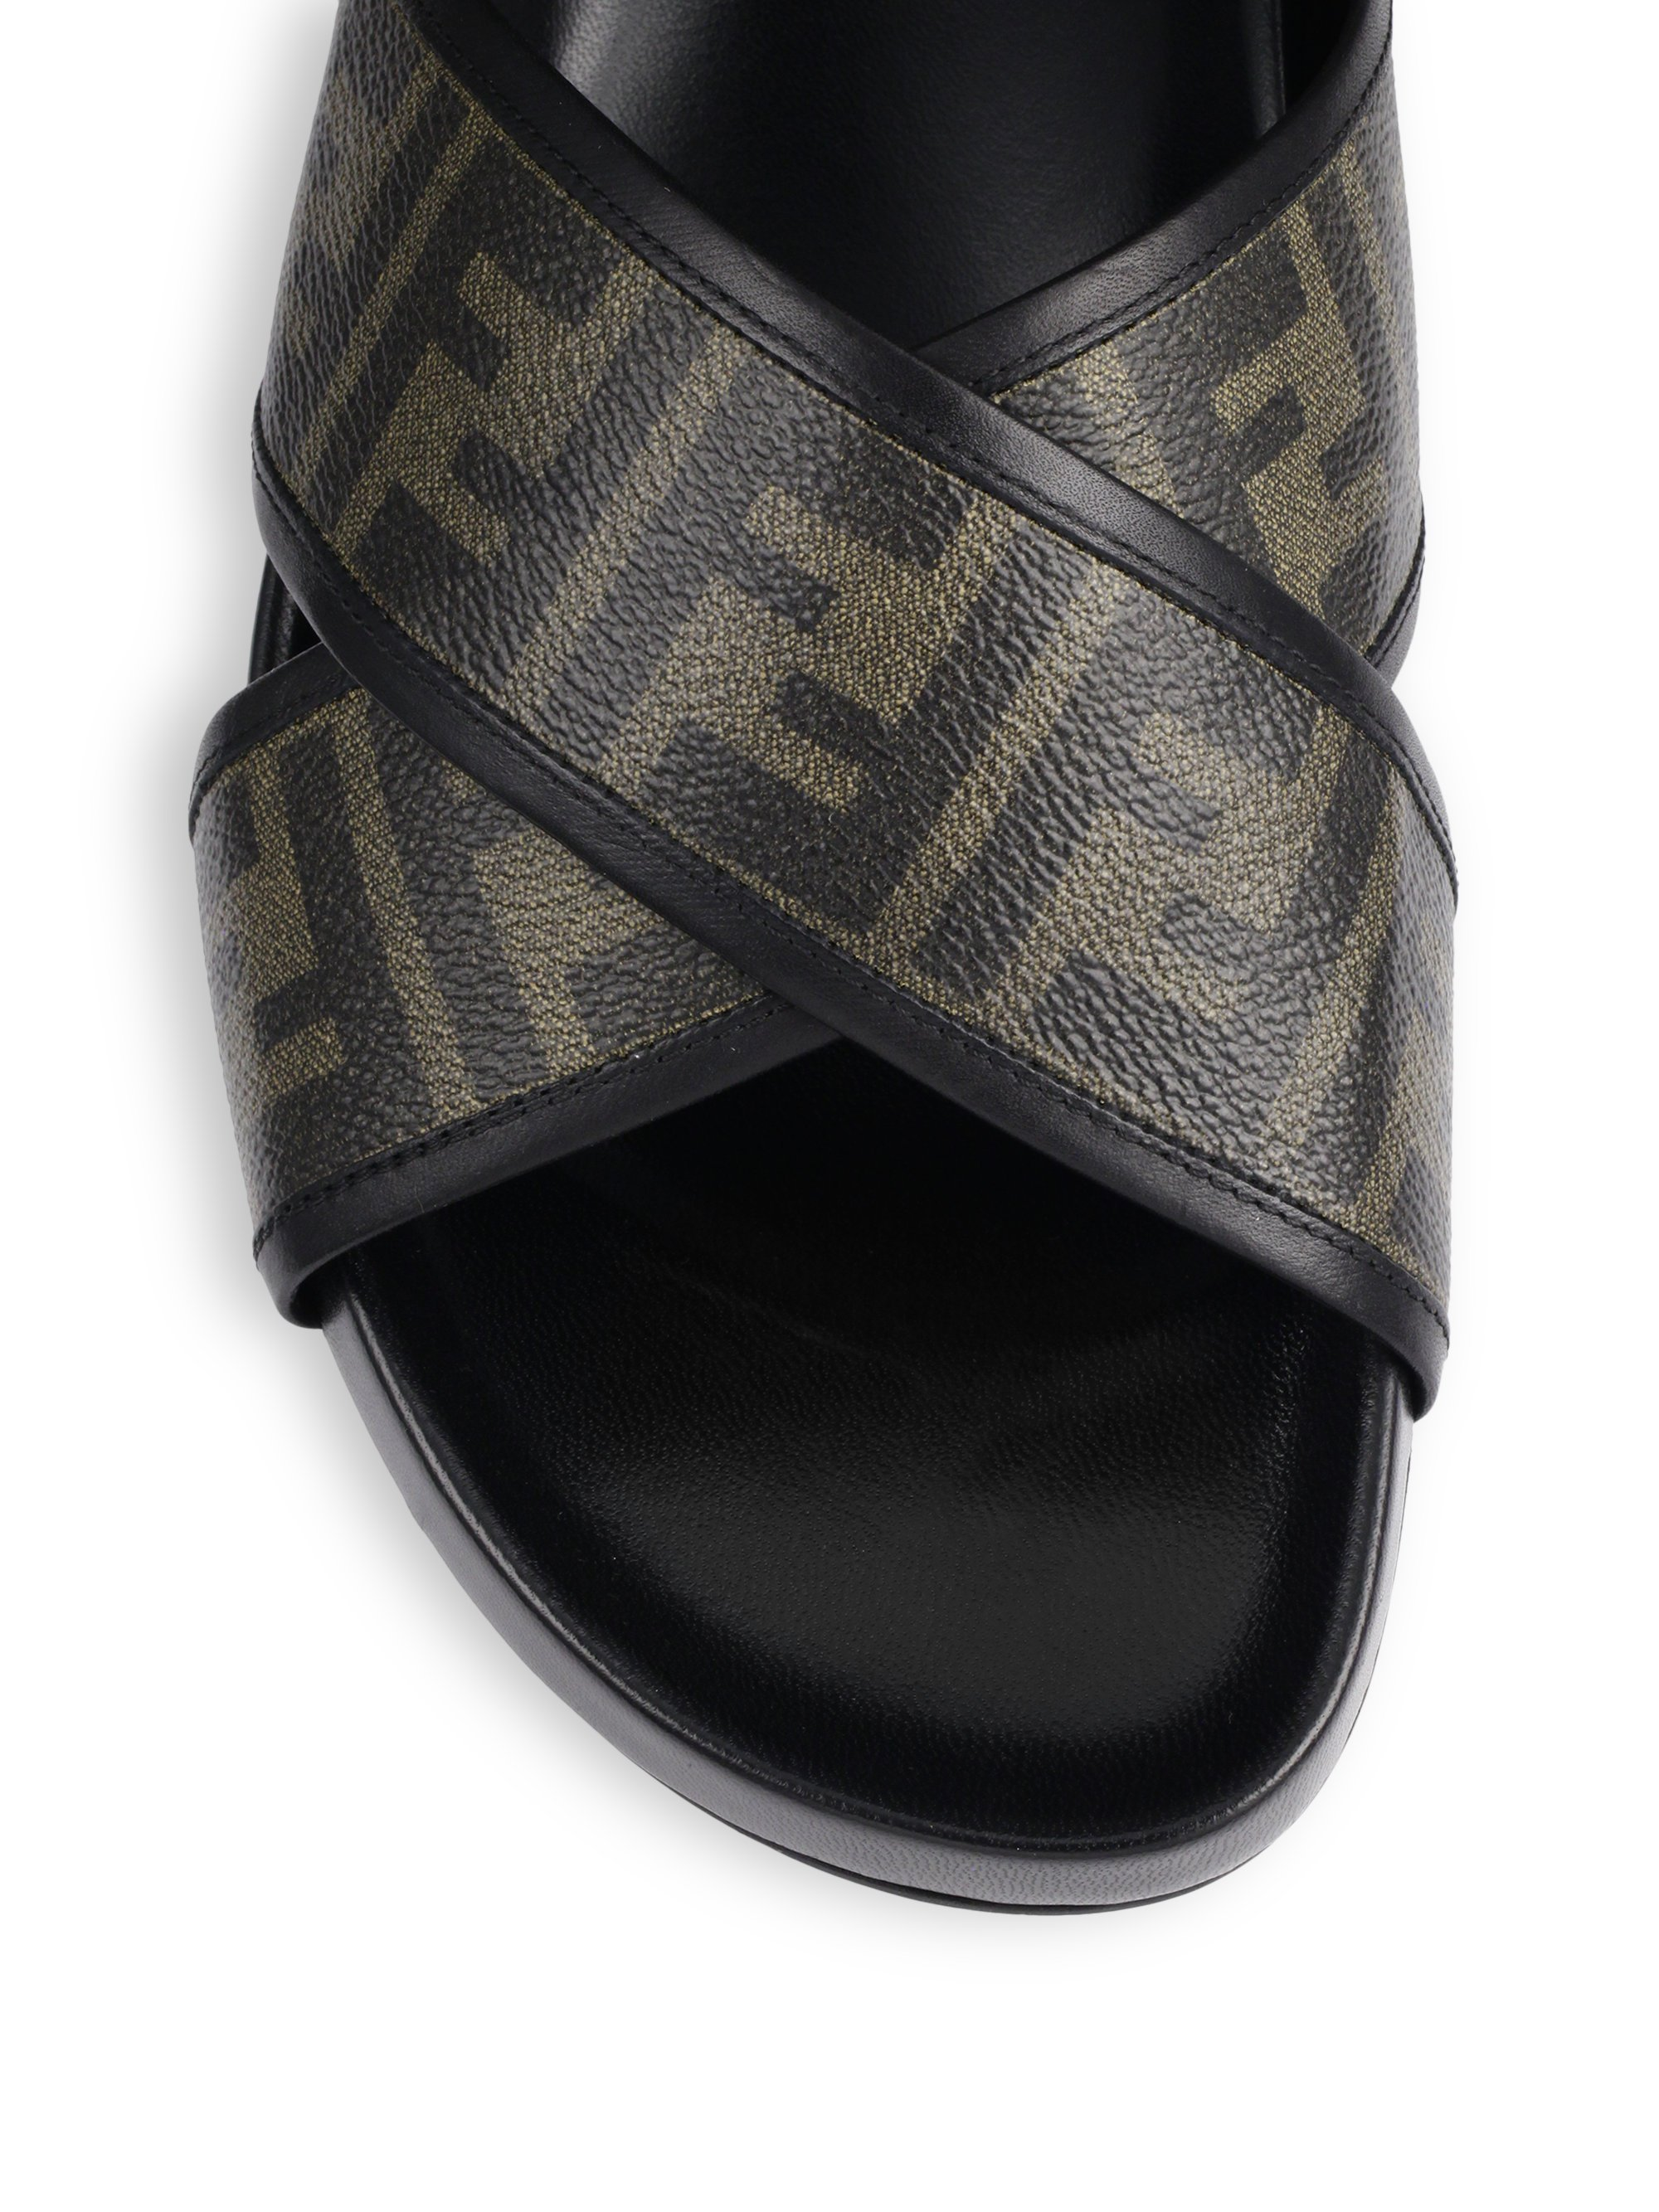 Lyst Fendi Zucca Logo Criss Cross Sandals In Brown For Men